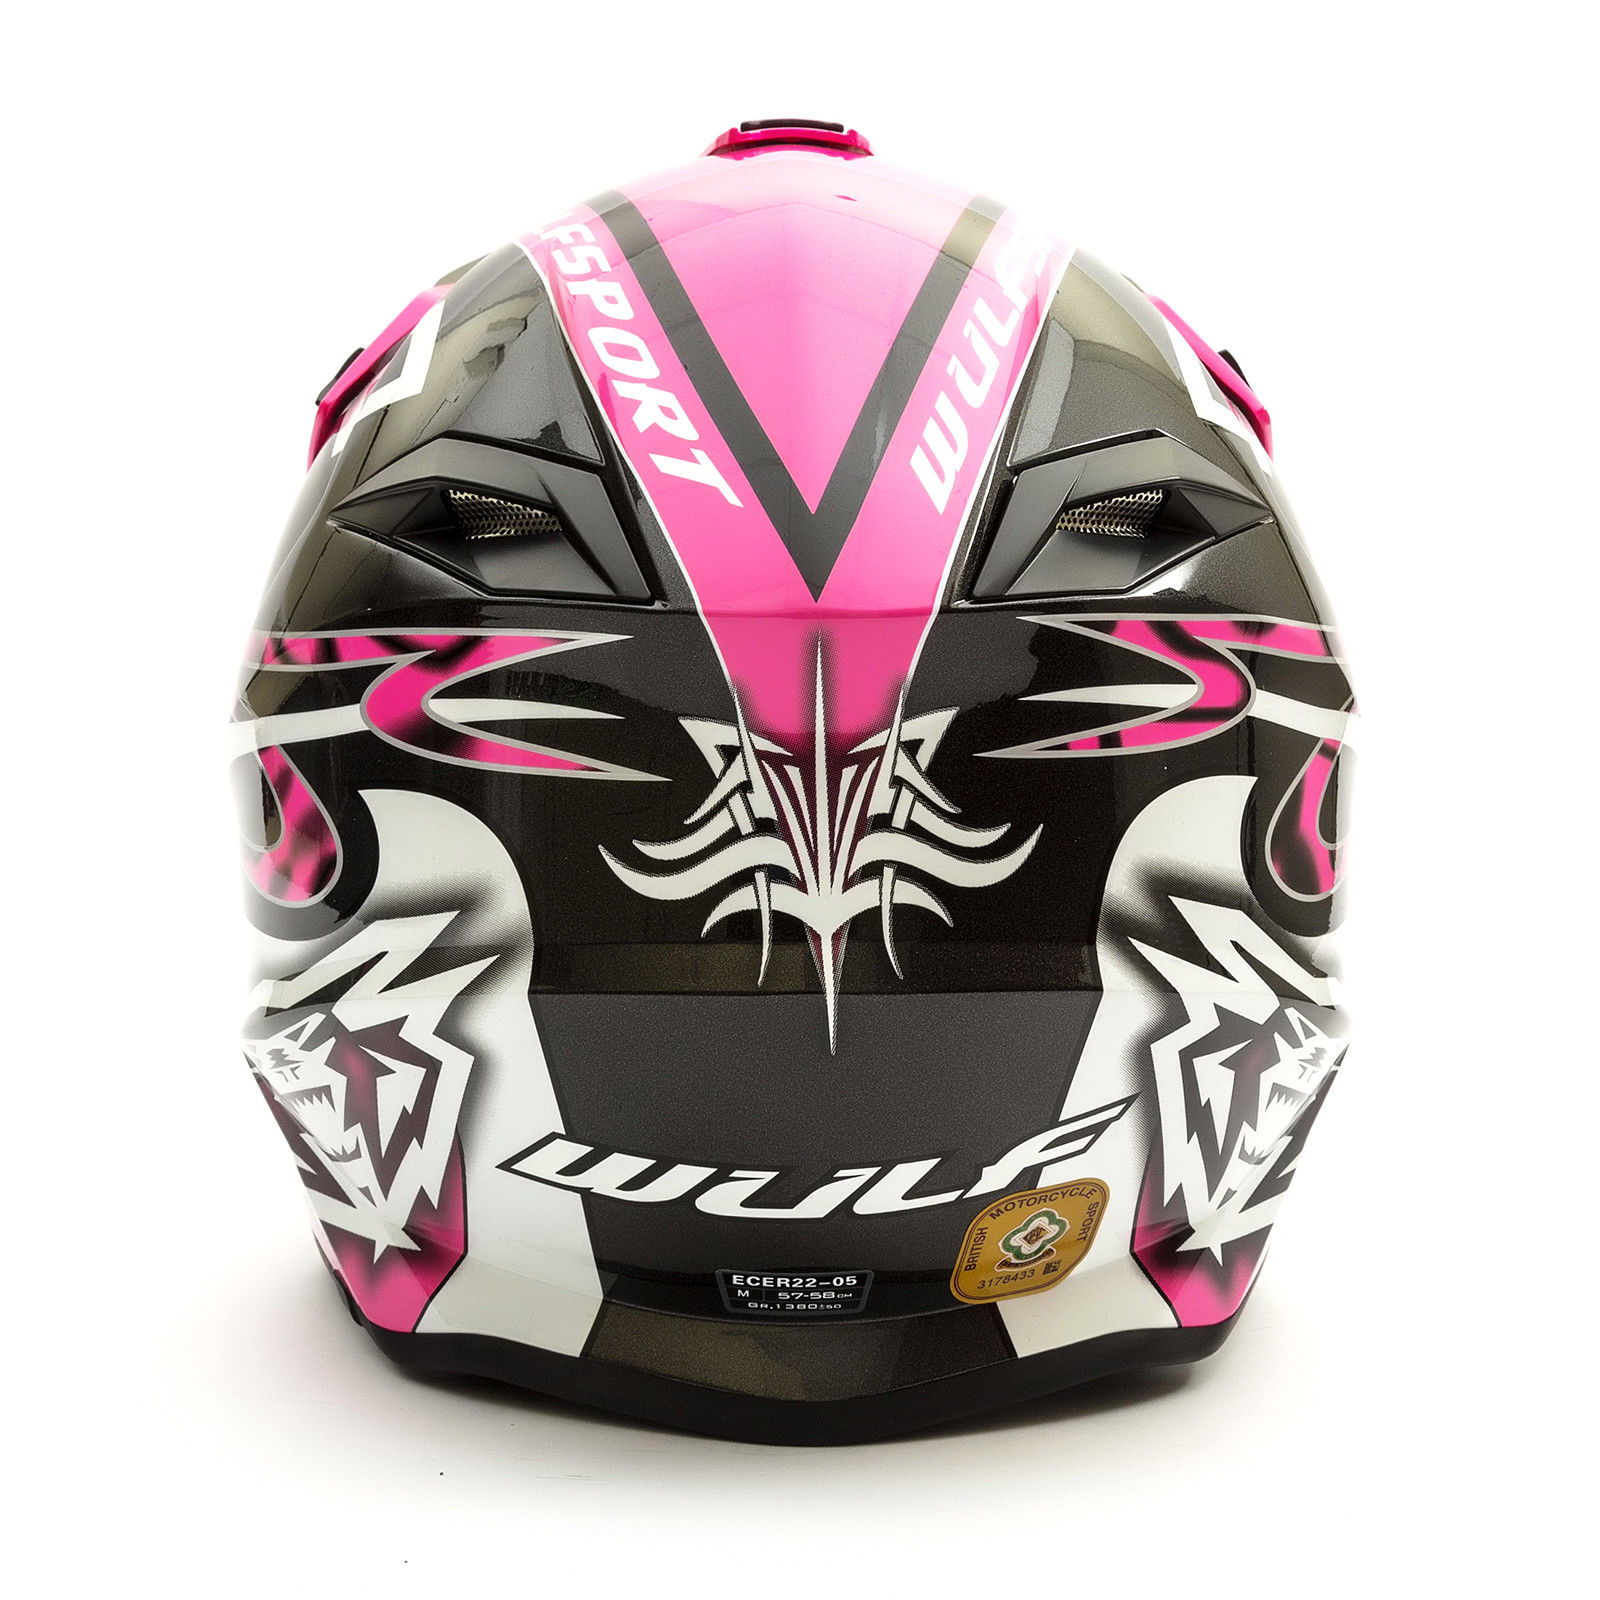 Wulfsport-Adult-Sceptre-Helmets-Motocross-Pitbike-Motorbike-Off-Road-Racing-ATV thumbnail 48